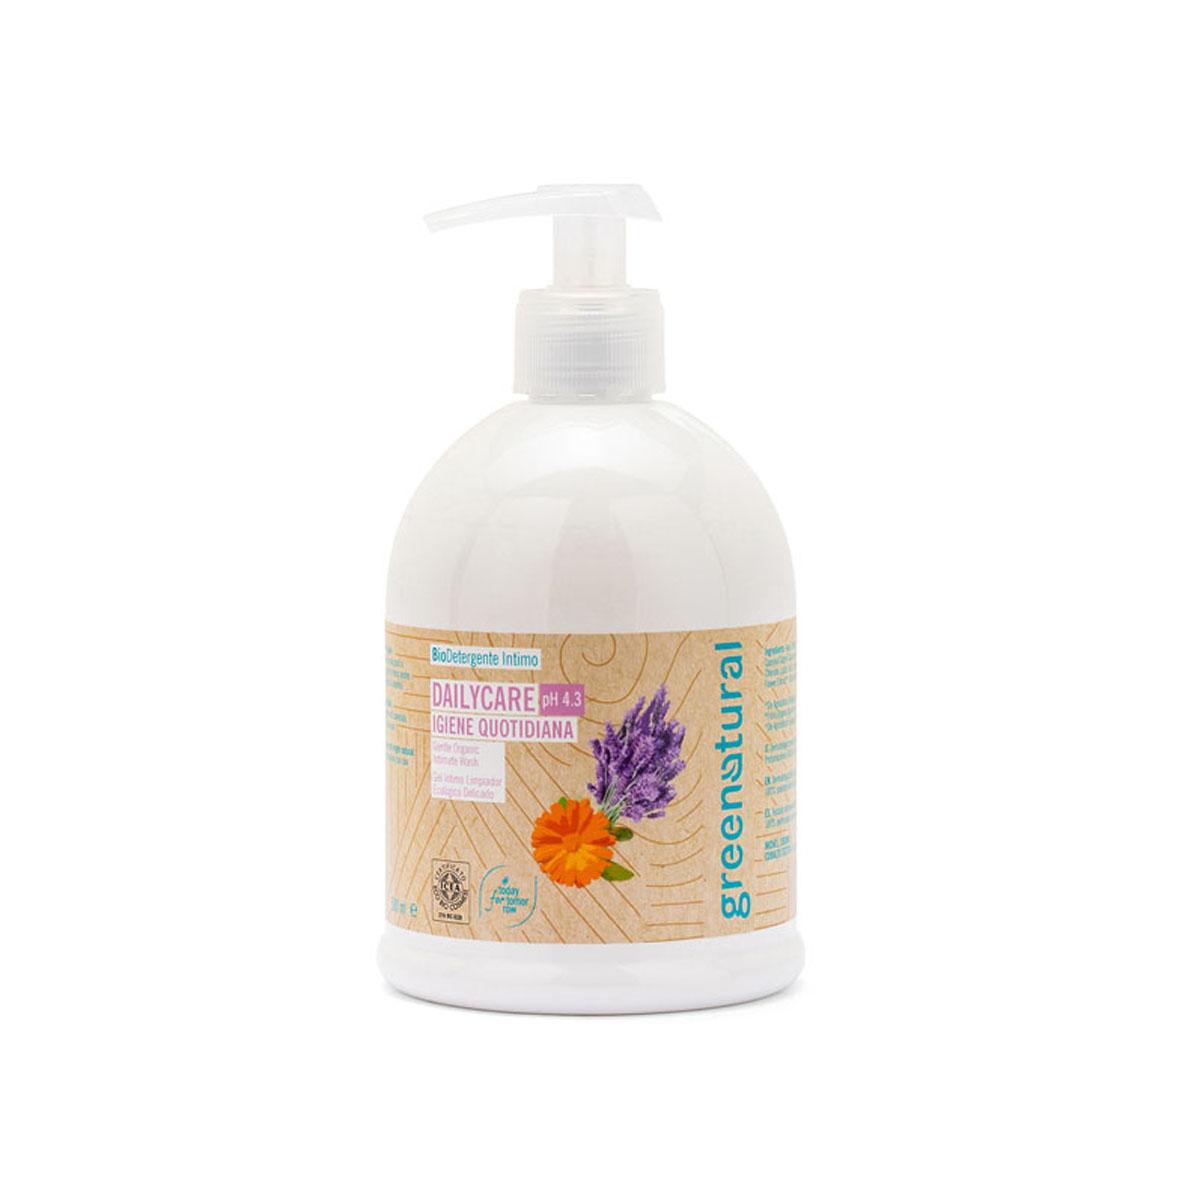 Greenatural – Detergente Intimo DAILYCARE pH 4.3 100ml